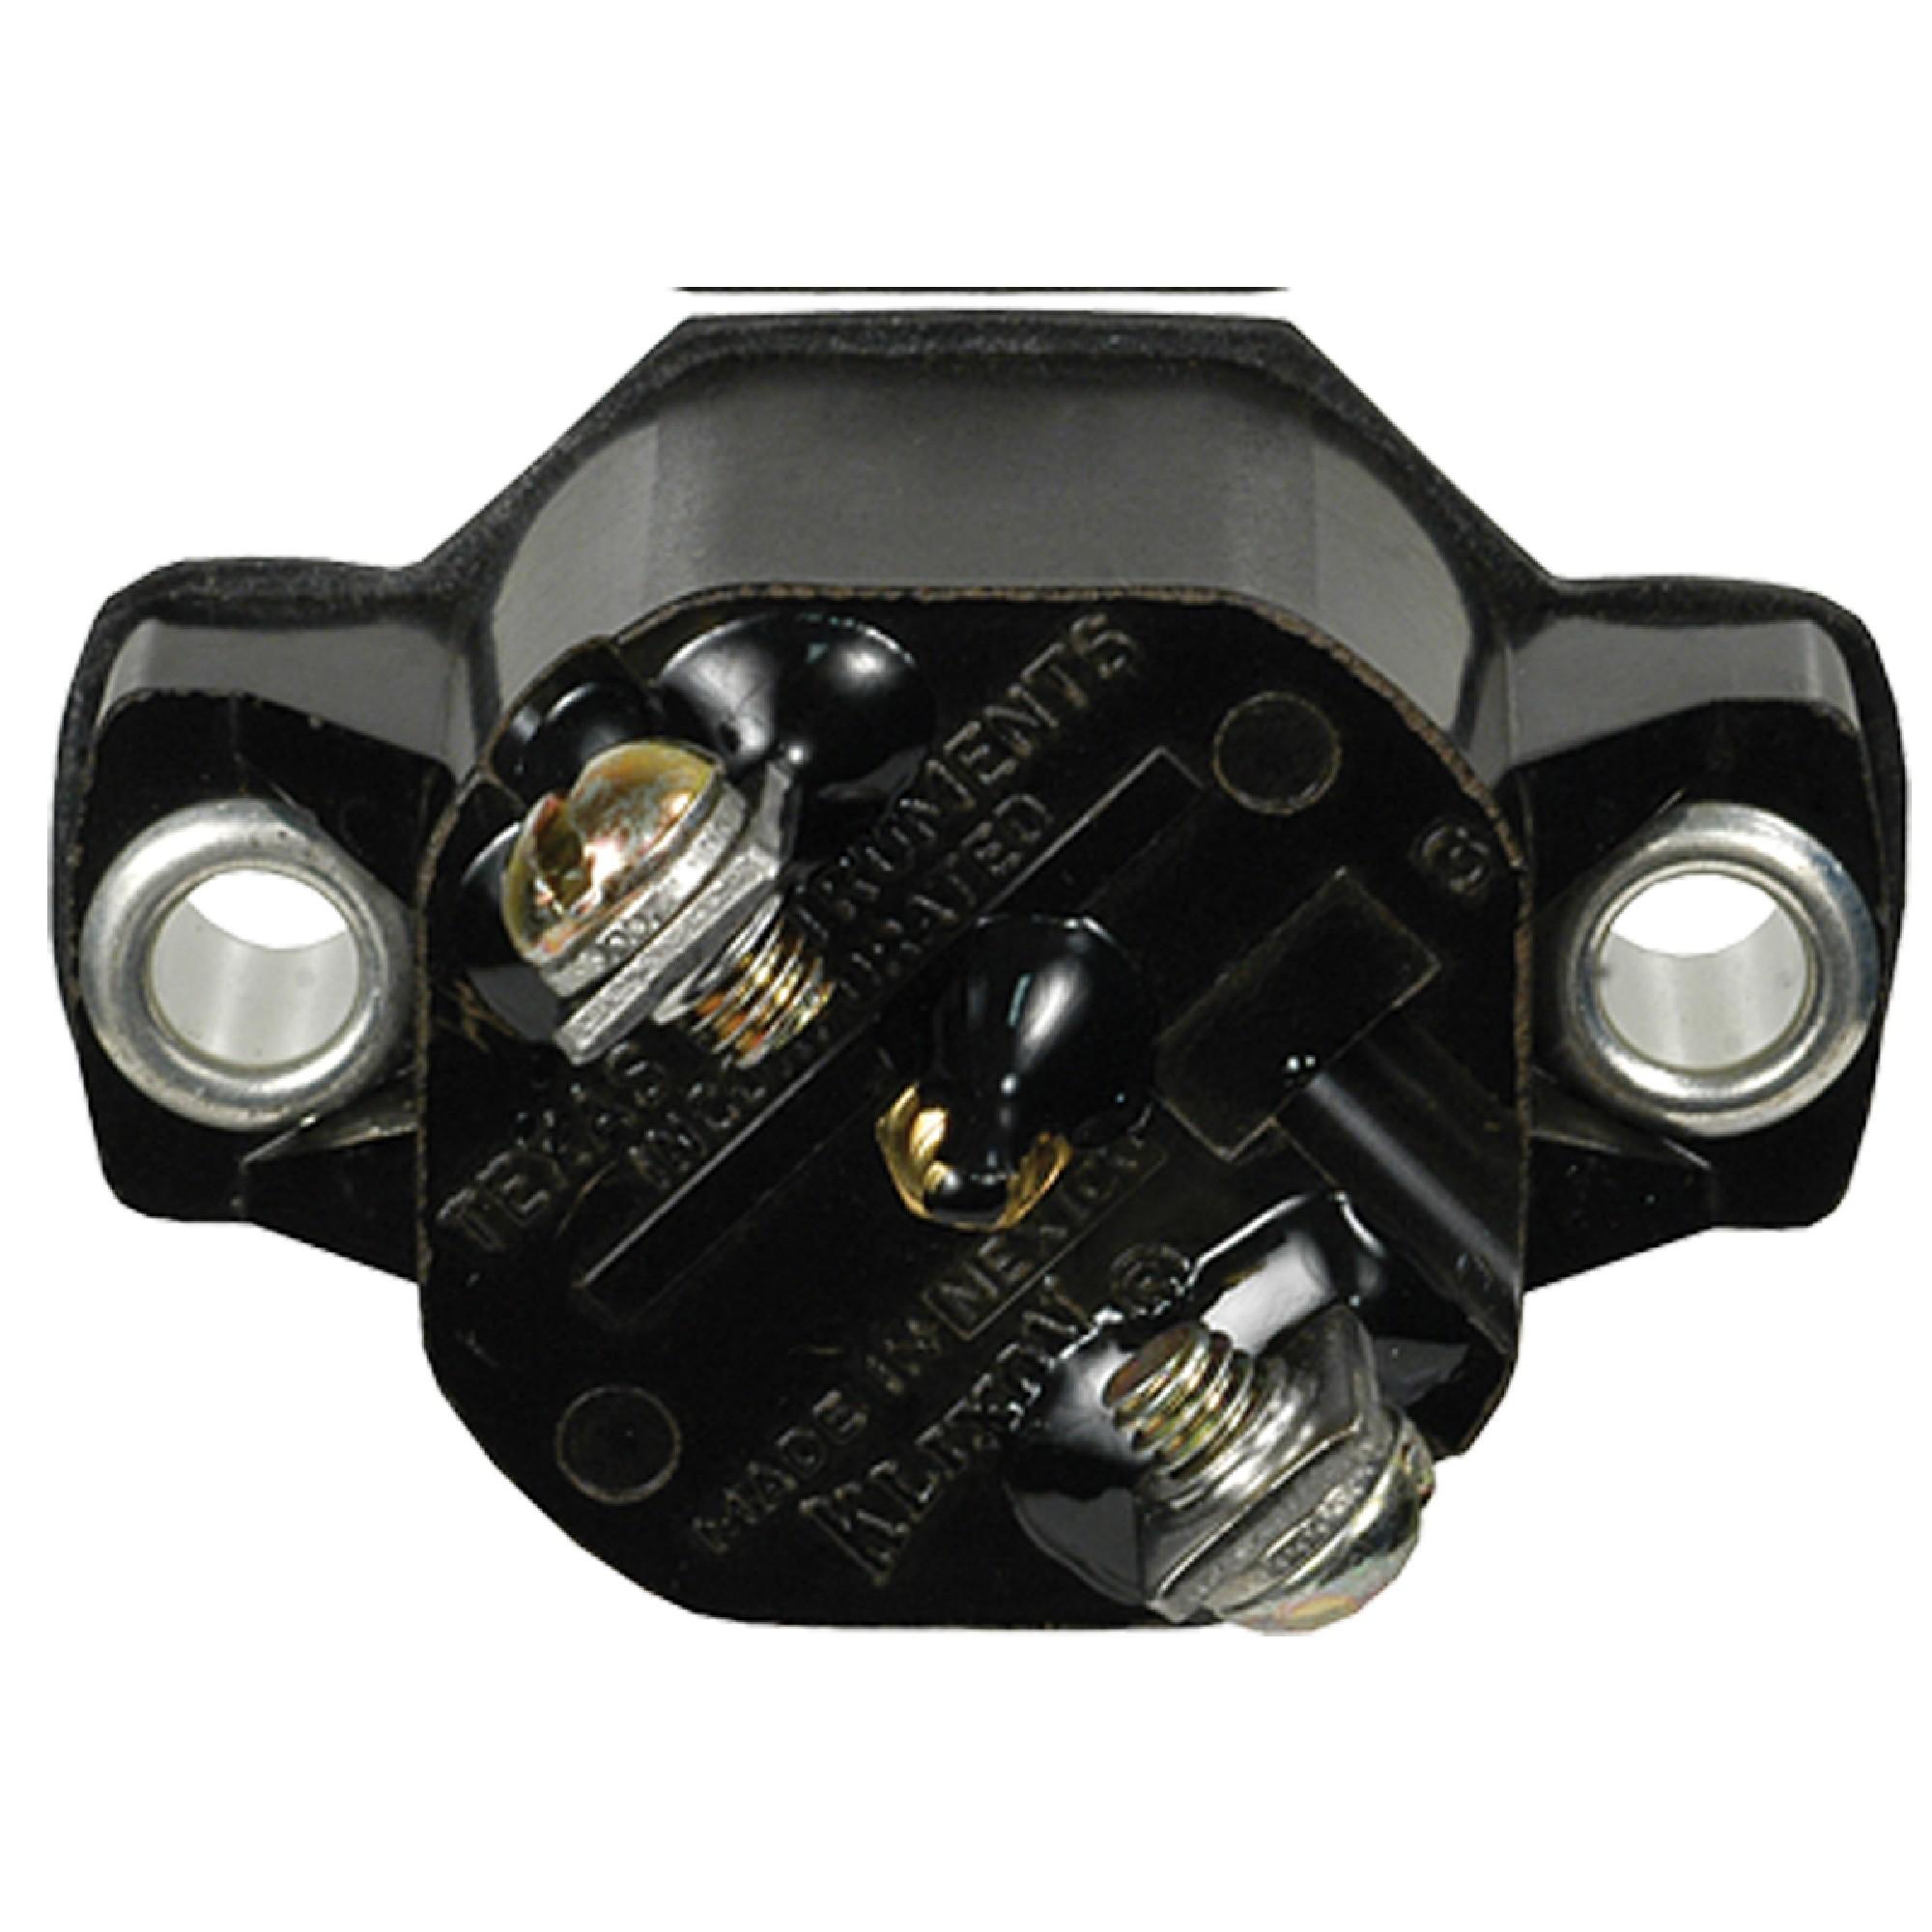 New SDLA120 Klixon 120A Circuit Breaker for Universal